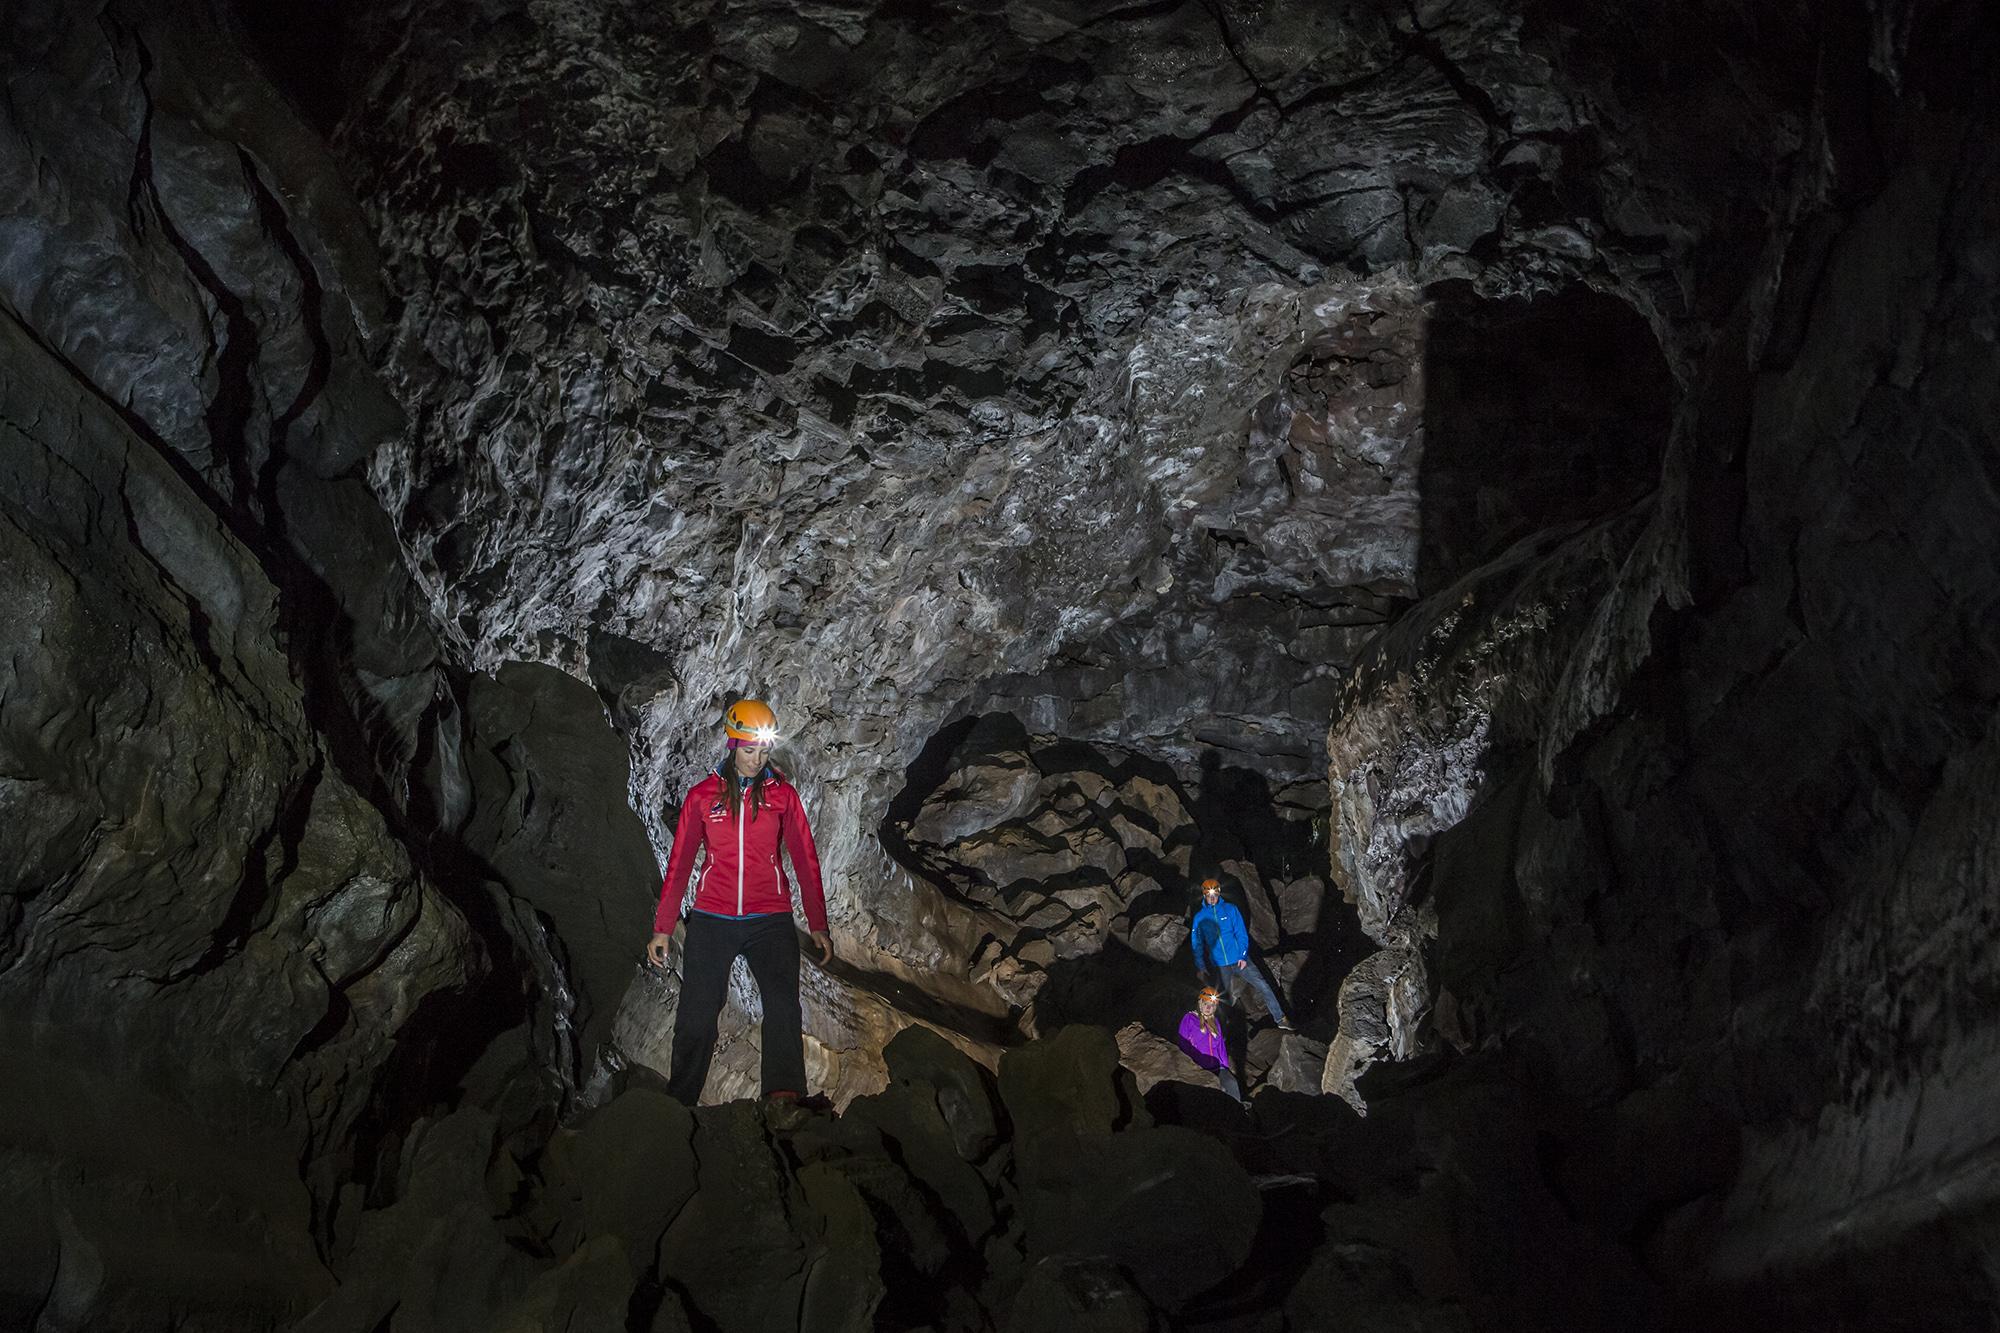 On the ATV & Underworld Lava Caving Trip from Reykjavík you'll visit the stunning Leiðarendi cave.